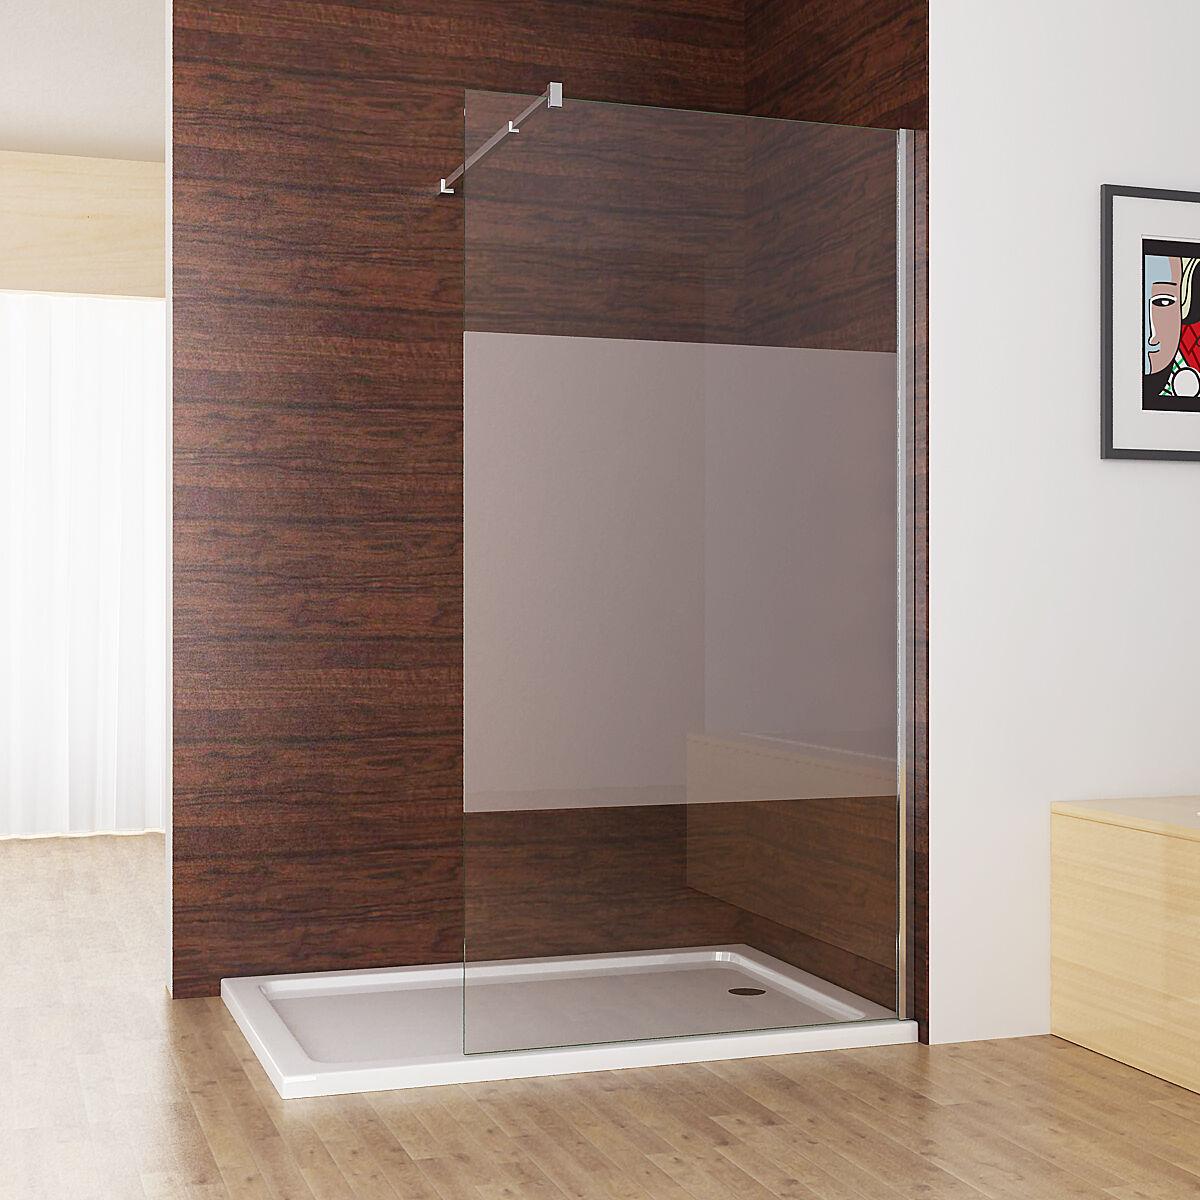 walkin dusche duschabtrennung duschwand 10mm nano. Black Bedroom Furniture Sets. Home Design Ideas